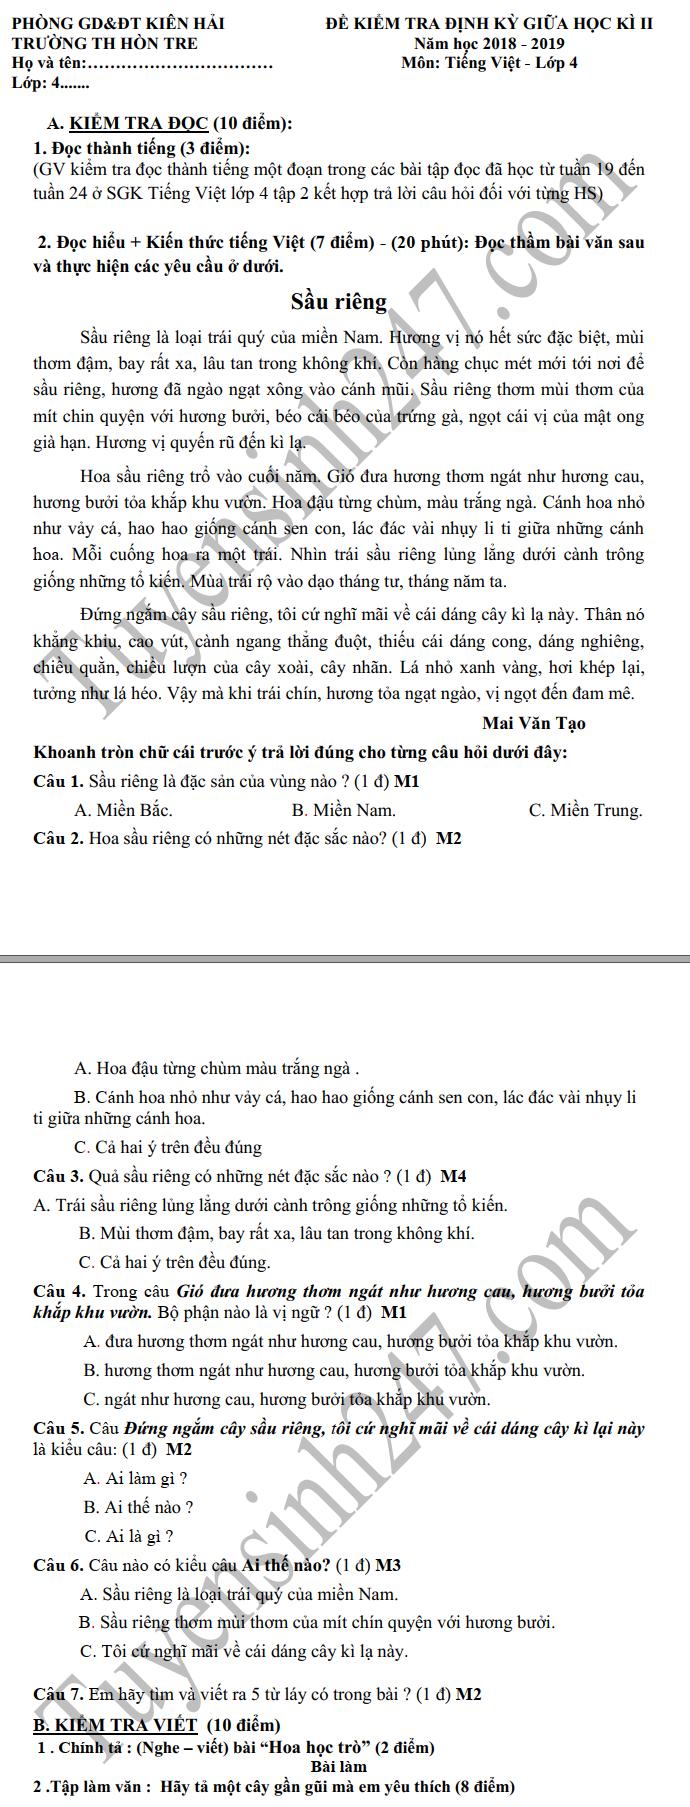 De thi giua ki 2 lop 4 mon Tieng Viet - TH Hon Tre 2019